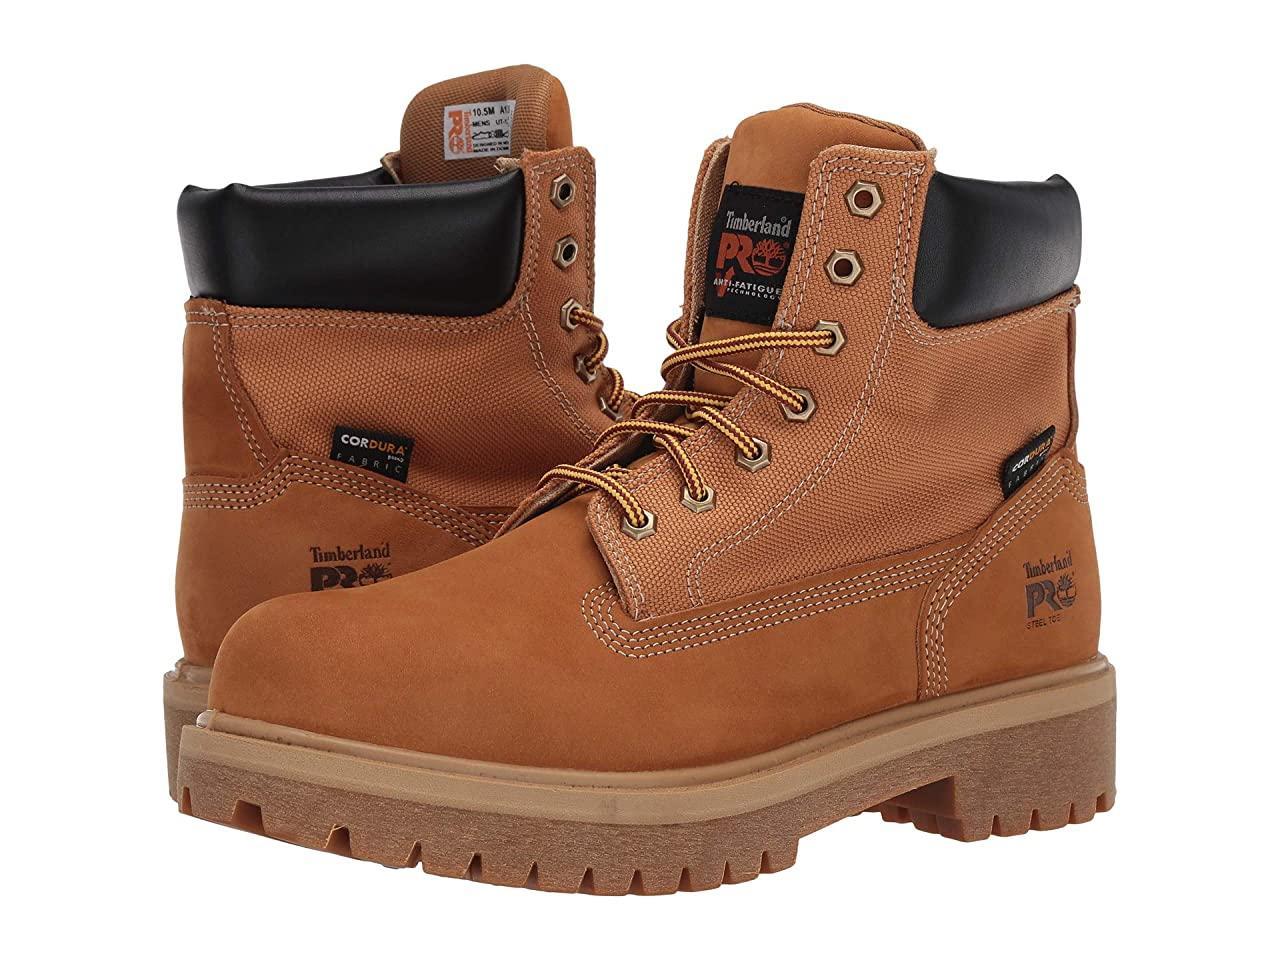 "Ботинки/Сапоги (Оригинал) Timberland PRO Direct Attach 6"" Steel Safety Toe Wheat"